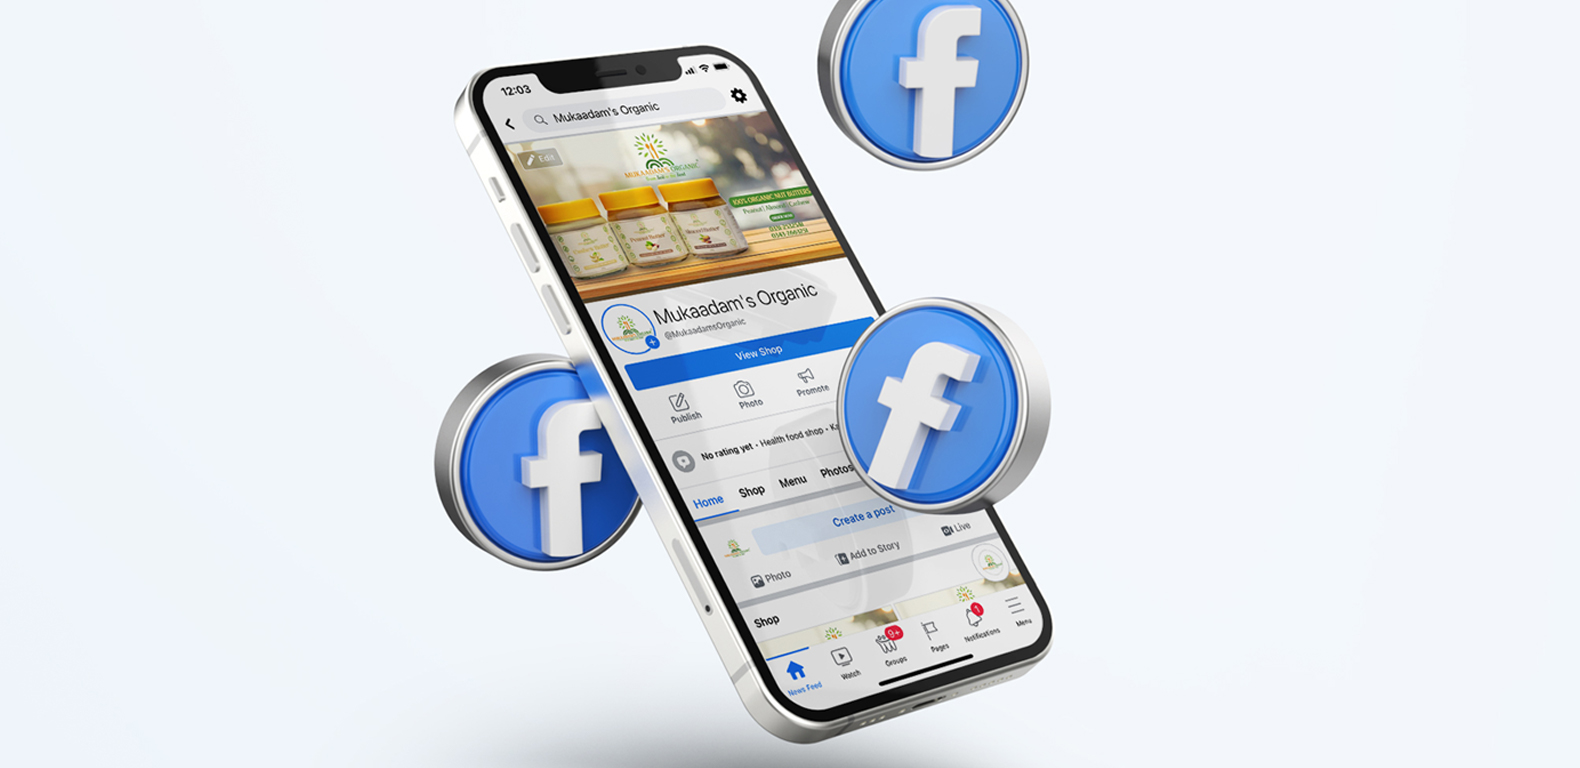 social-media-marketing-mukaadams-organic-facebook-posts-1